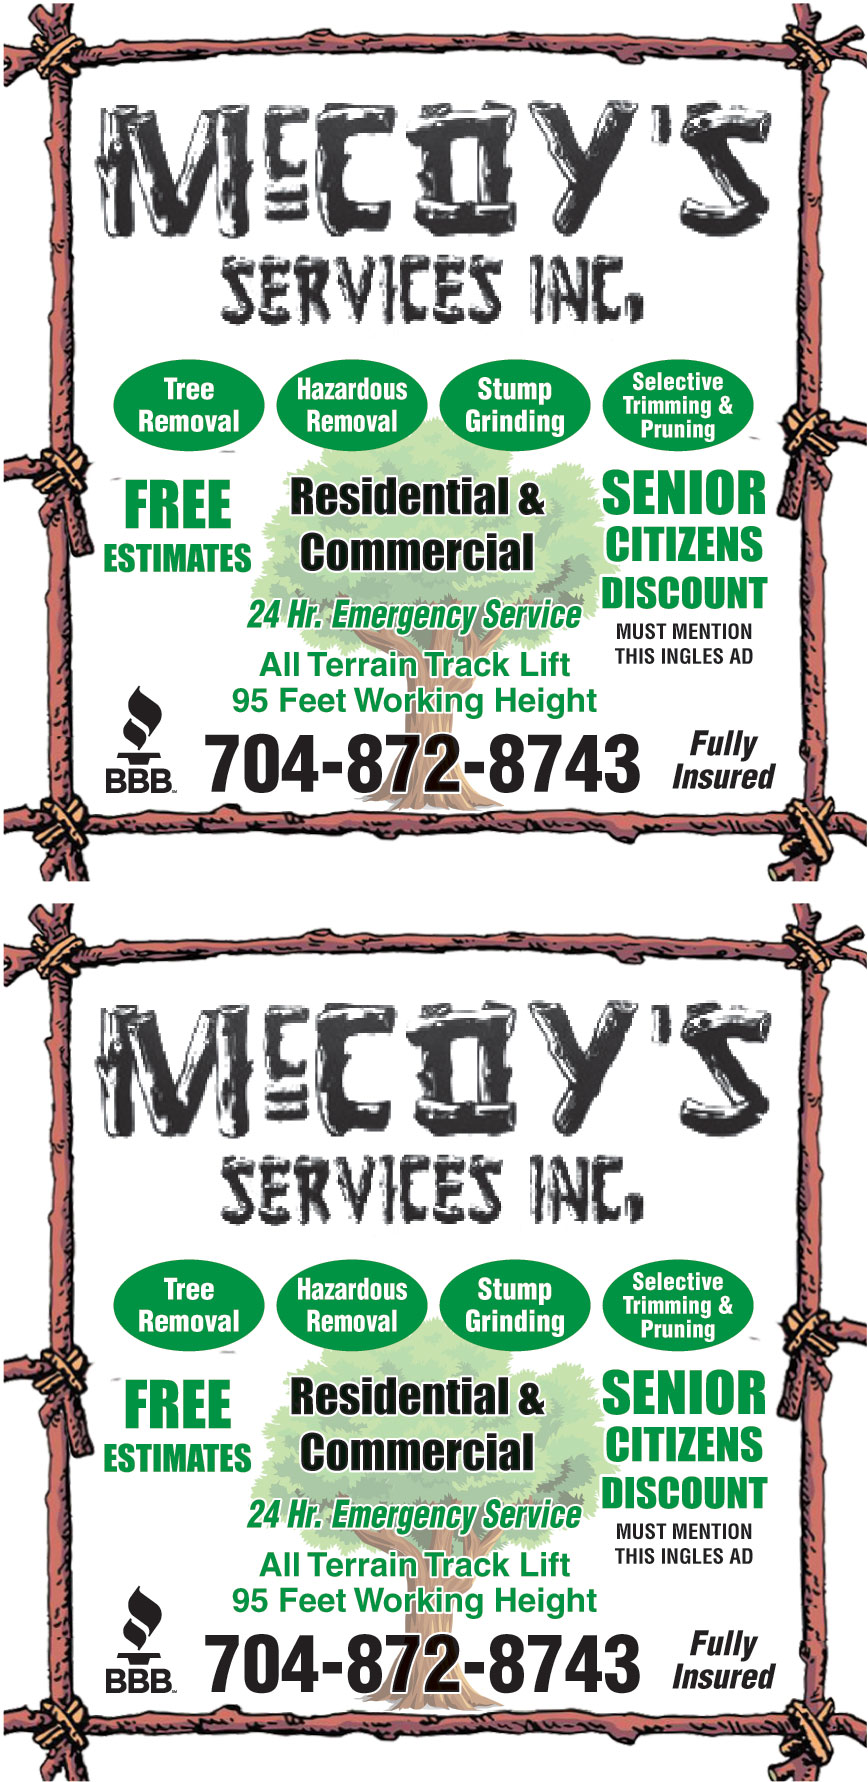 MCCOYS SERVICES INC